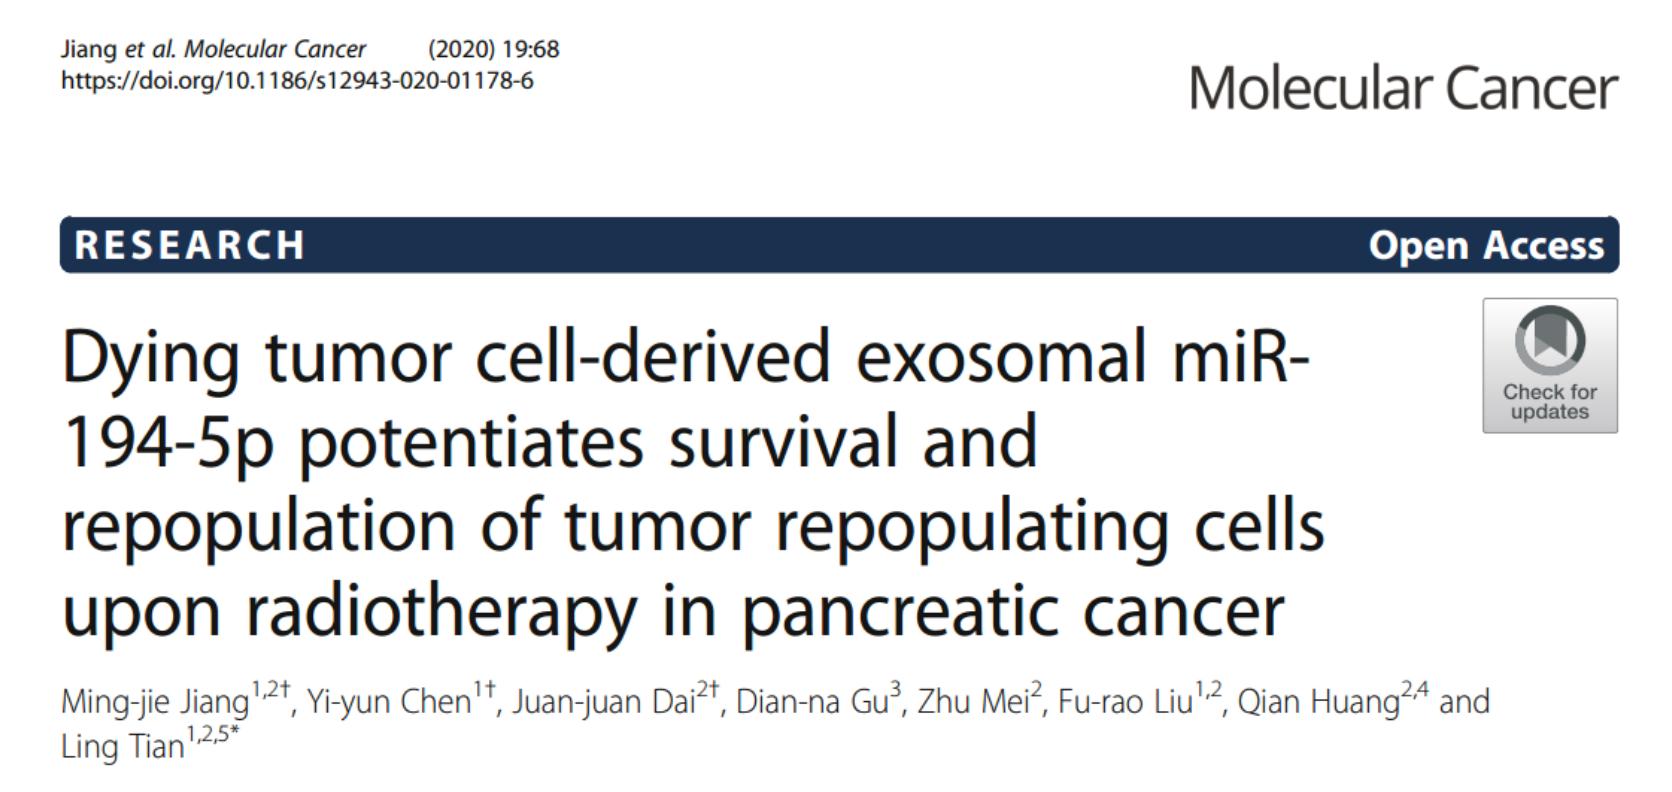 【Molecular Cancer】上海市第一人民医院:放疗后垂死癌细胞的外泌体miR-194-5p增强肿瘤再生细胞的存活和繁殖